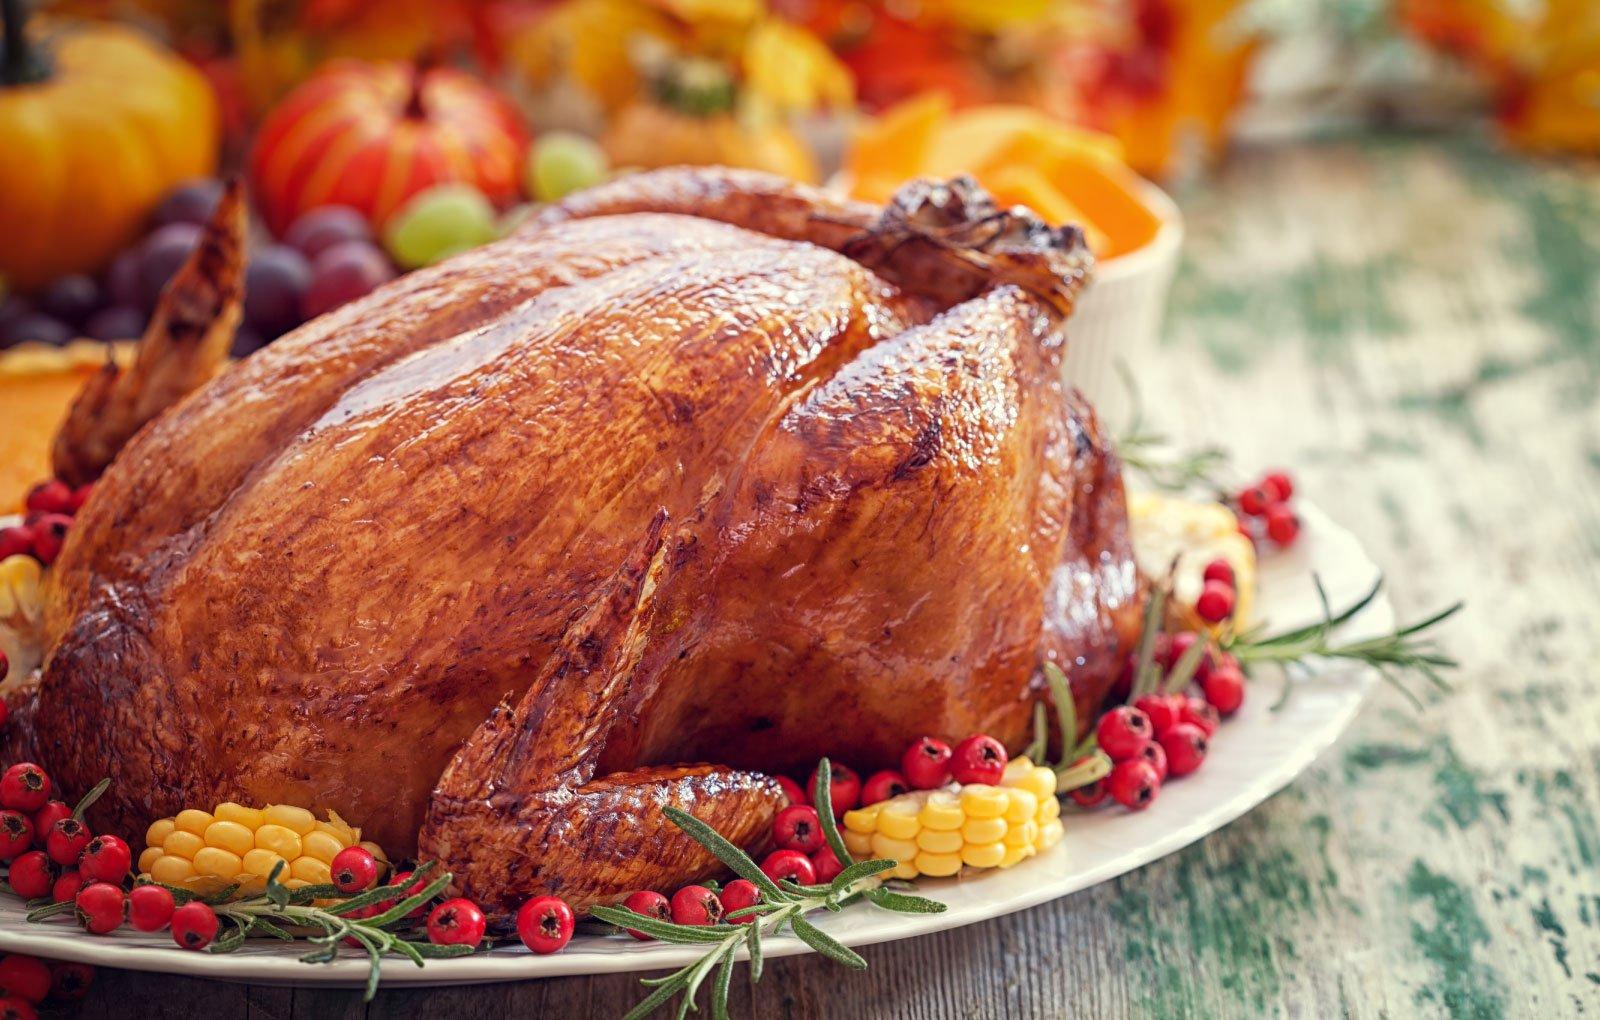 Golden Phoenix roasted turkey with herbs.